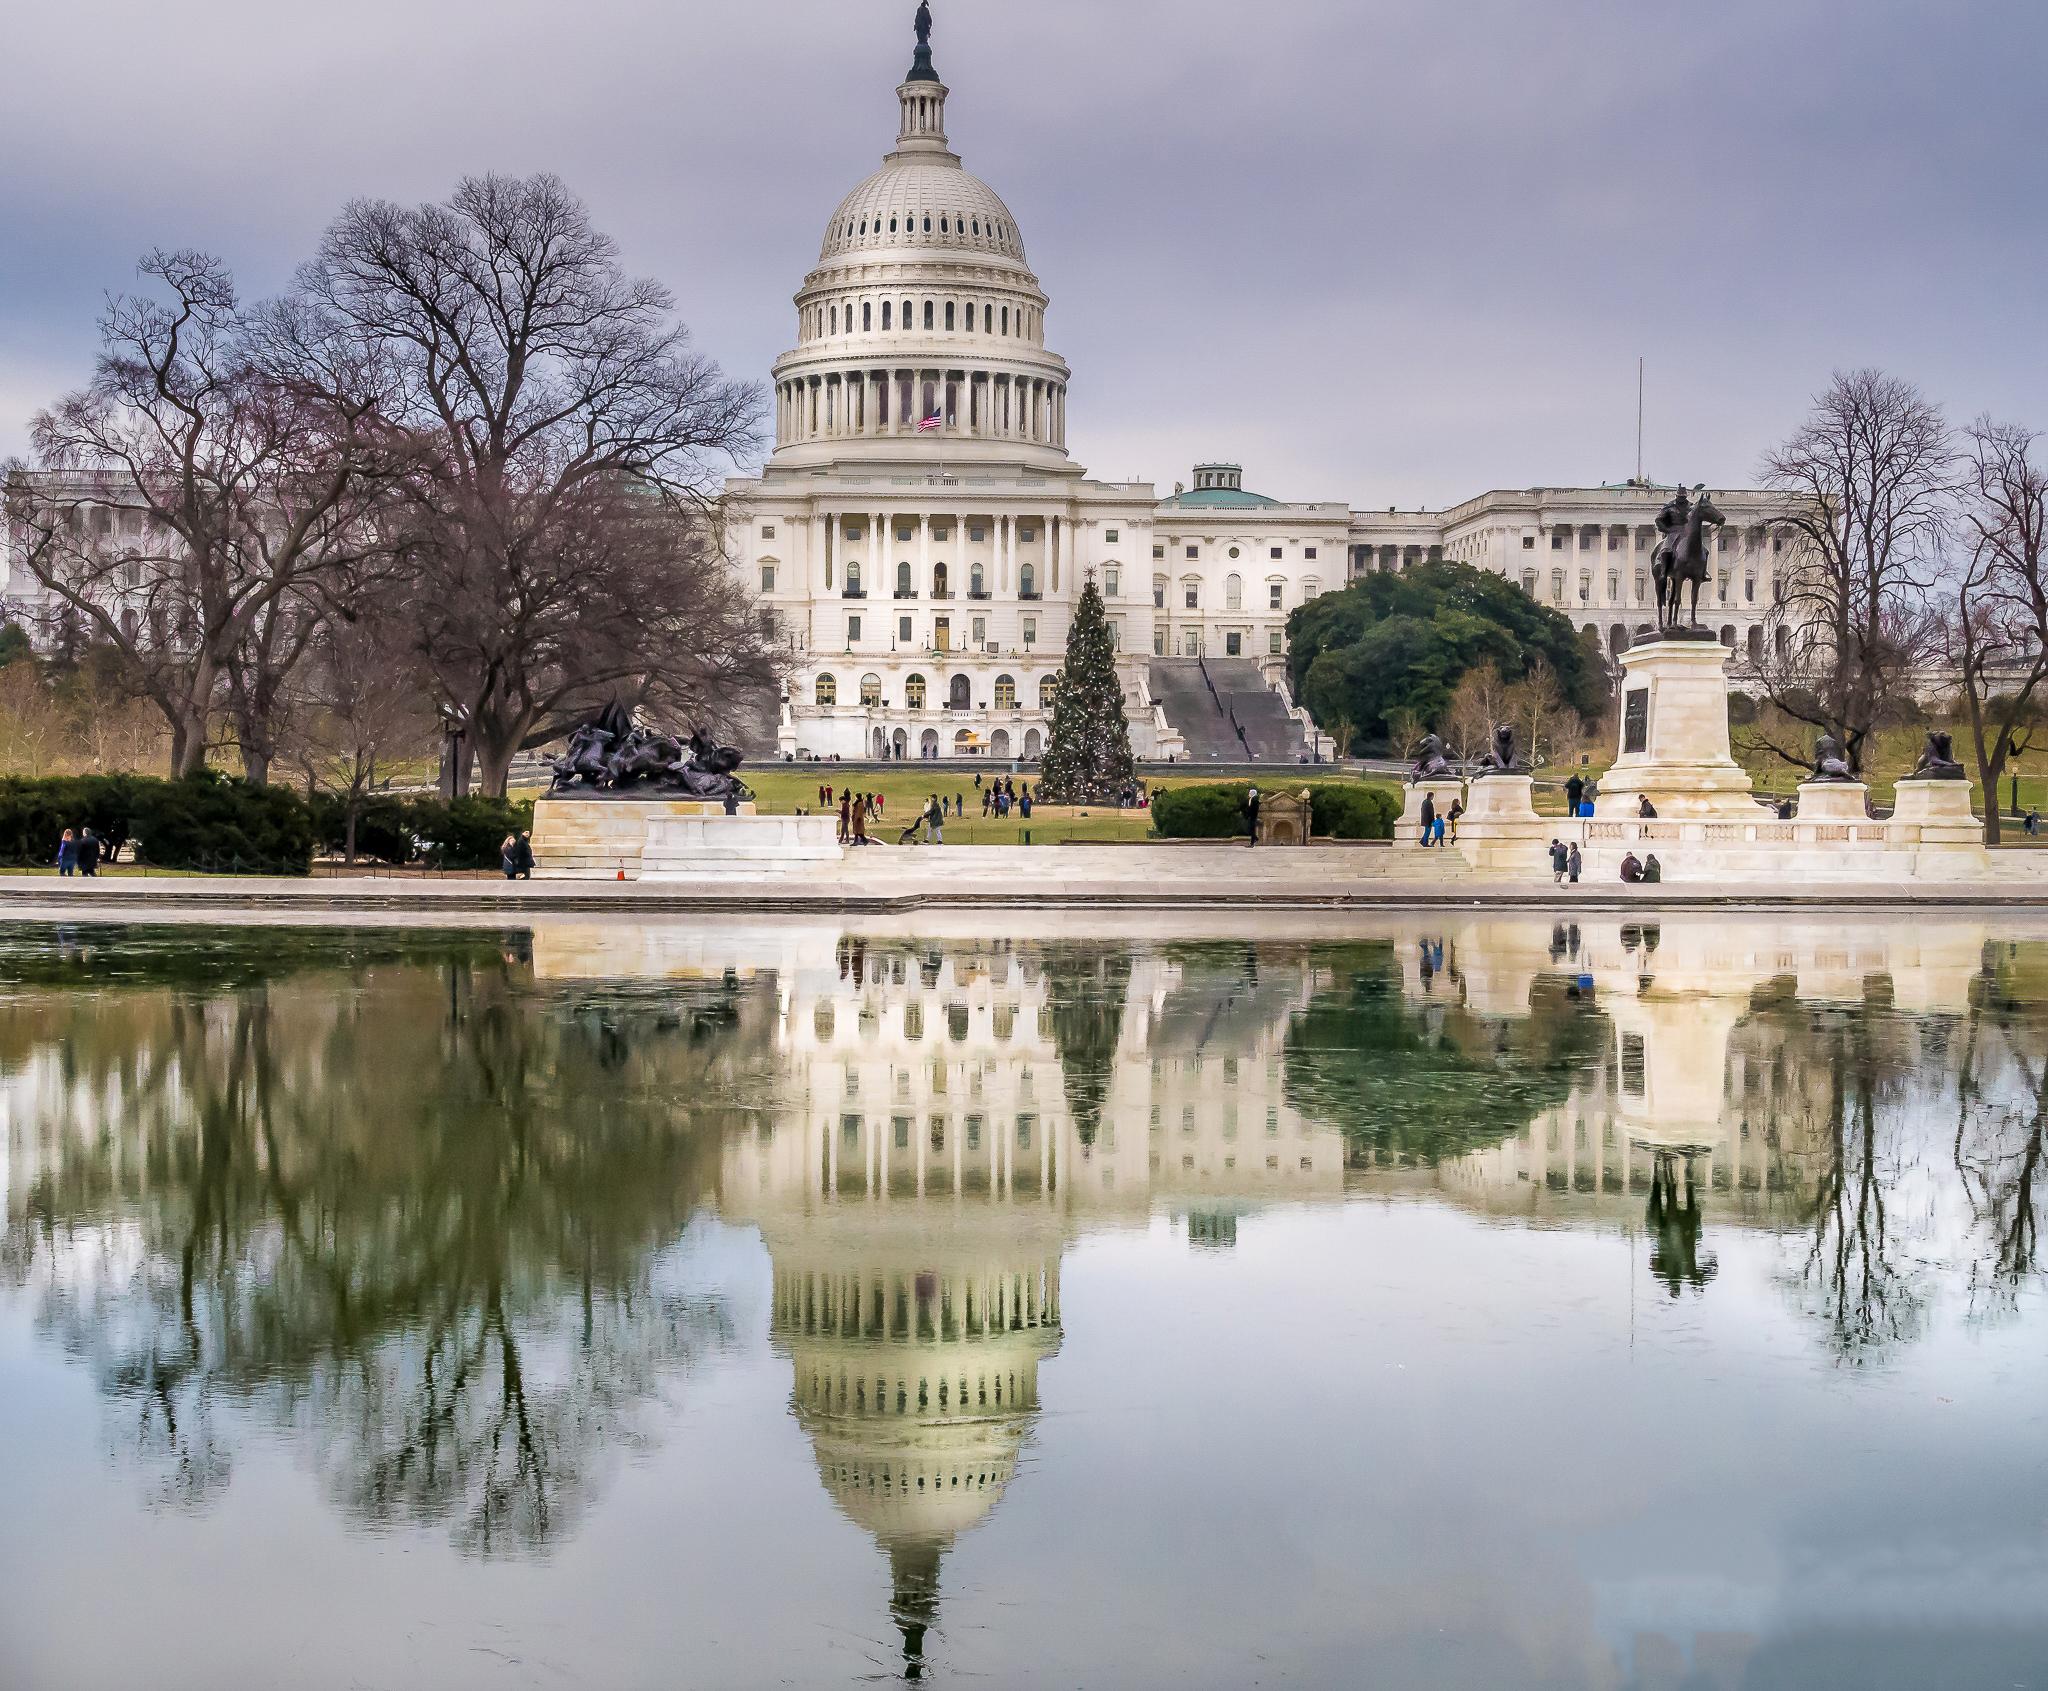 58081A - US Capital - Reflection